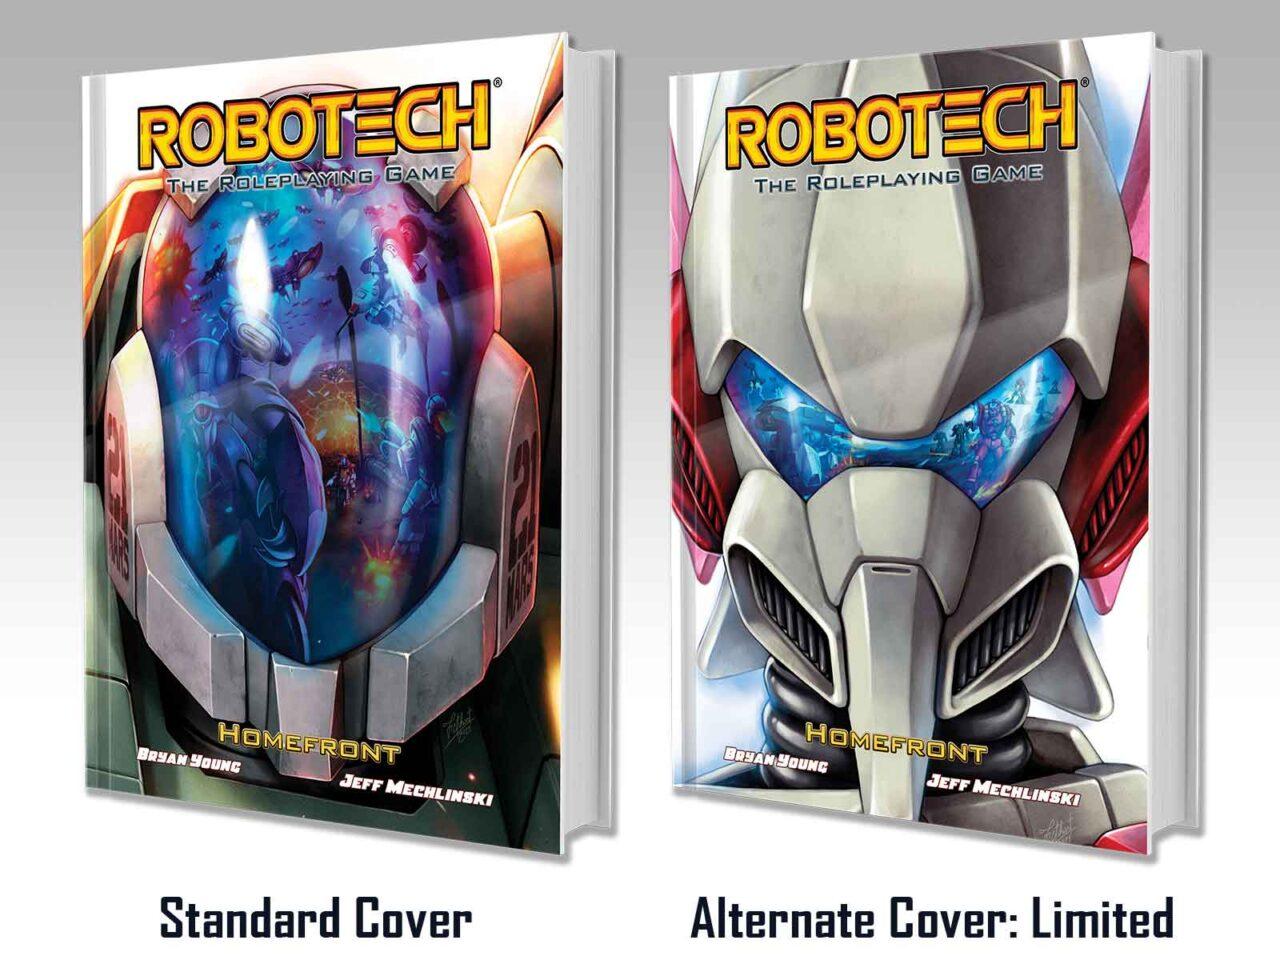 ks-rpg2-Covers-1280x960.jpg